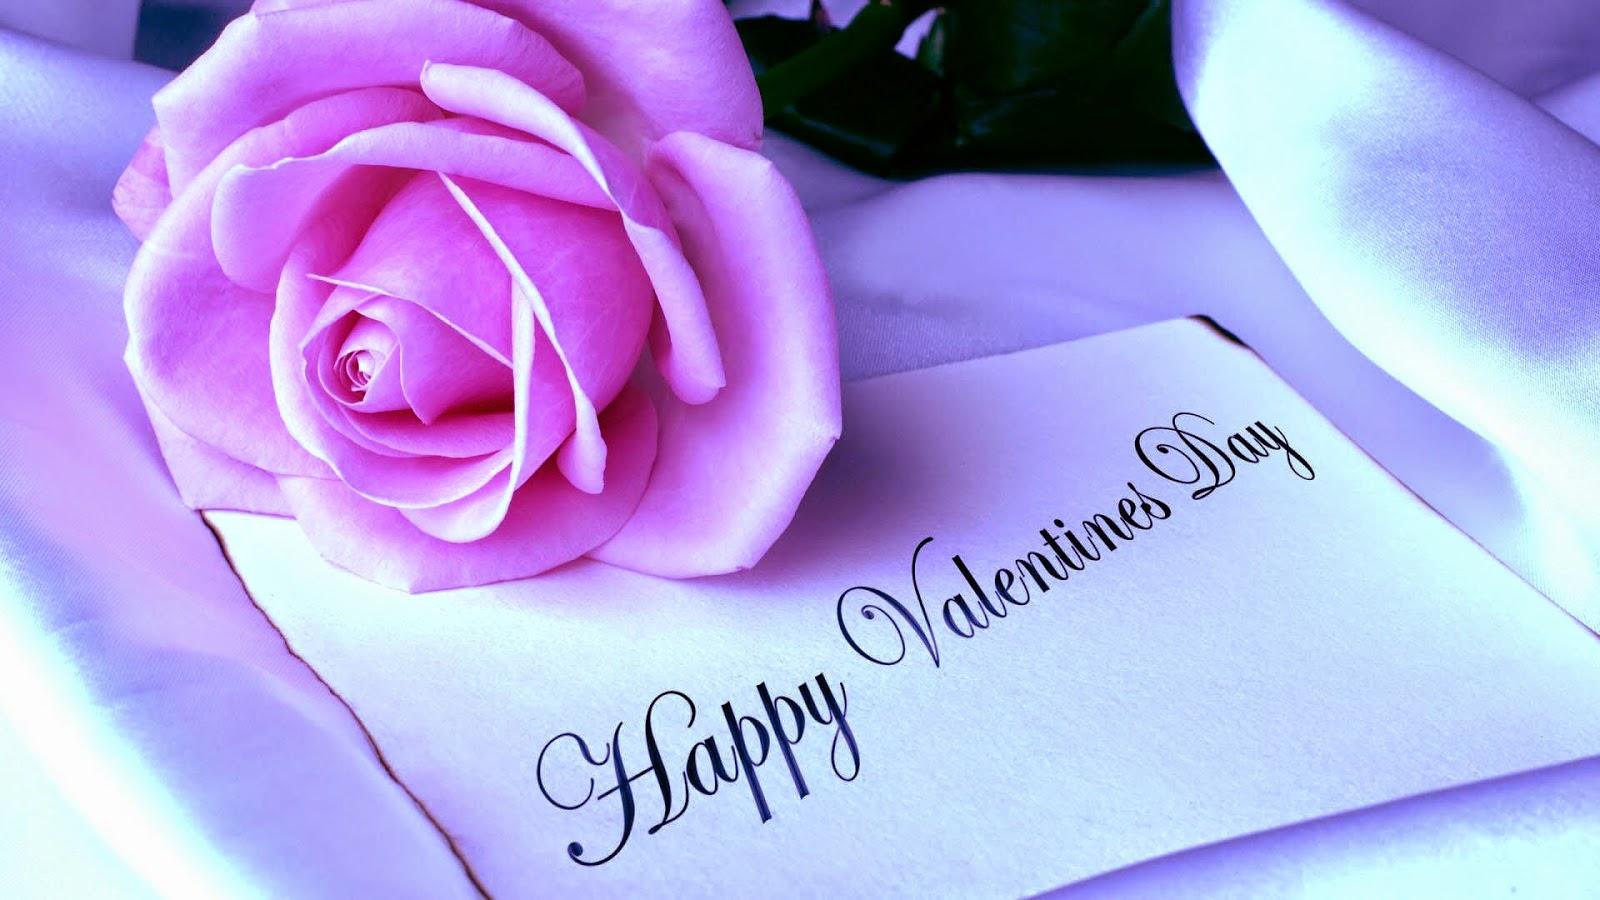 free valentines day images 2015 valentine day wallpaper